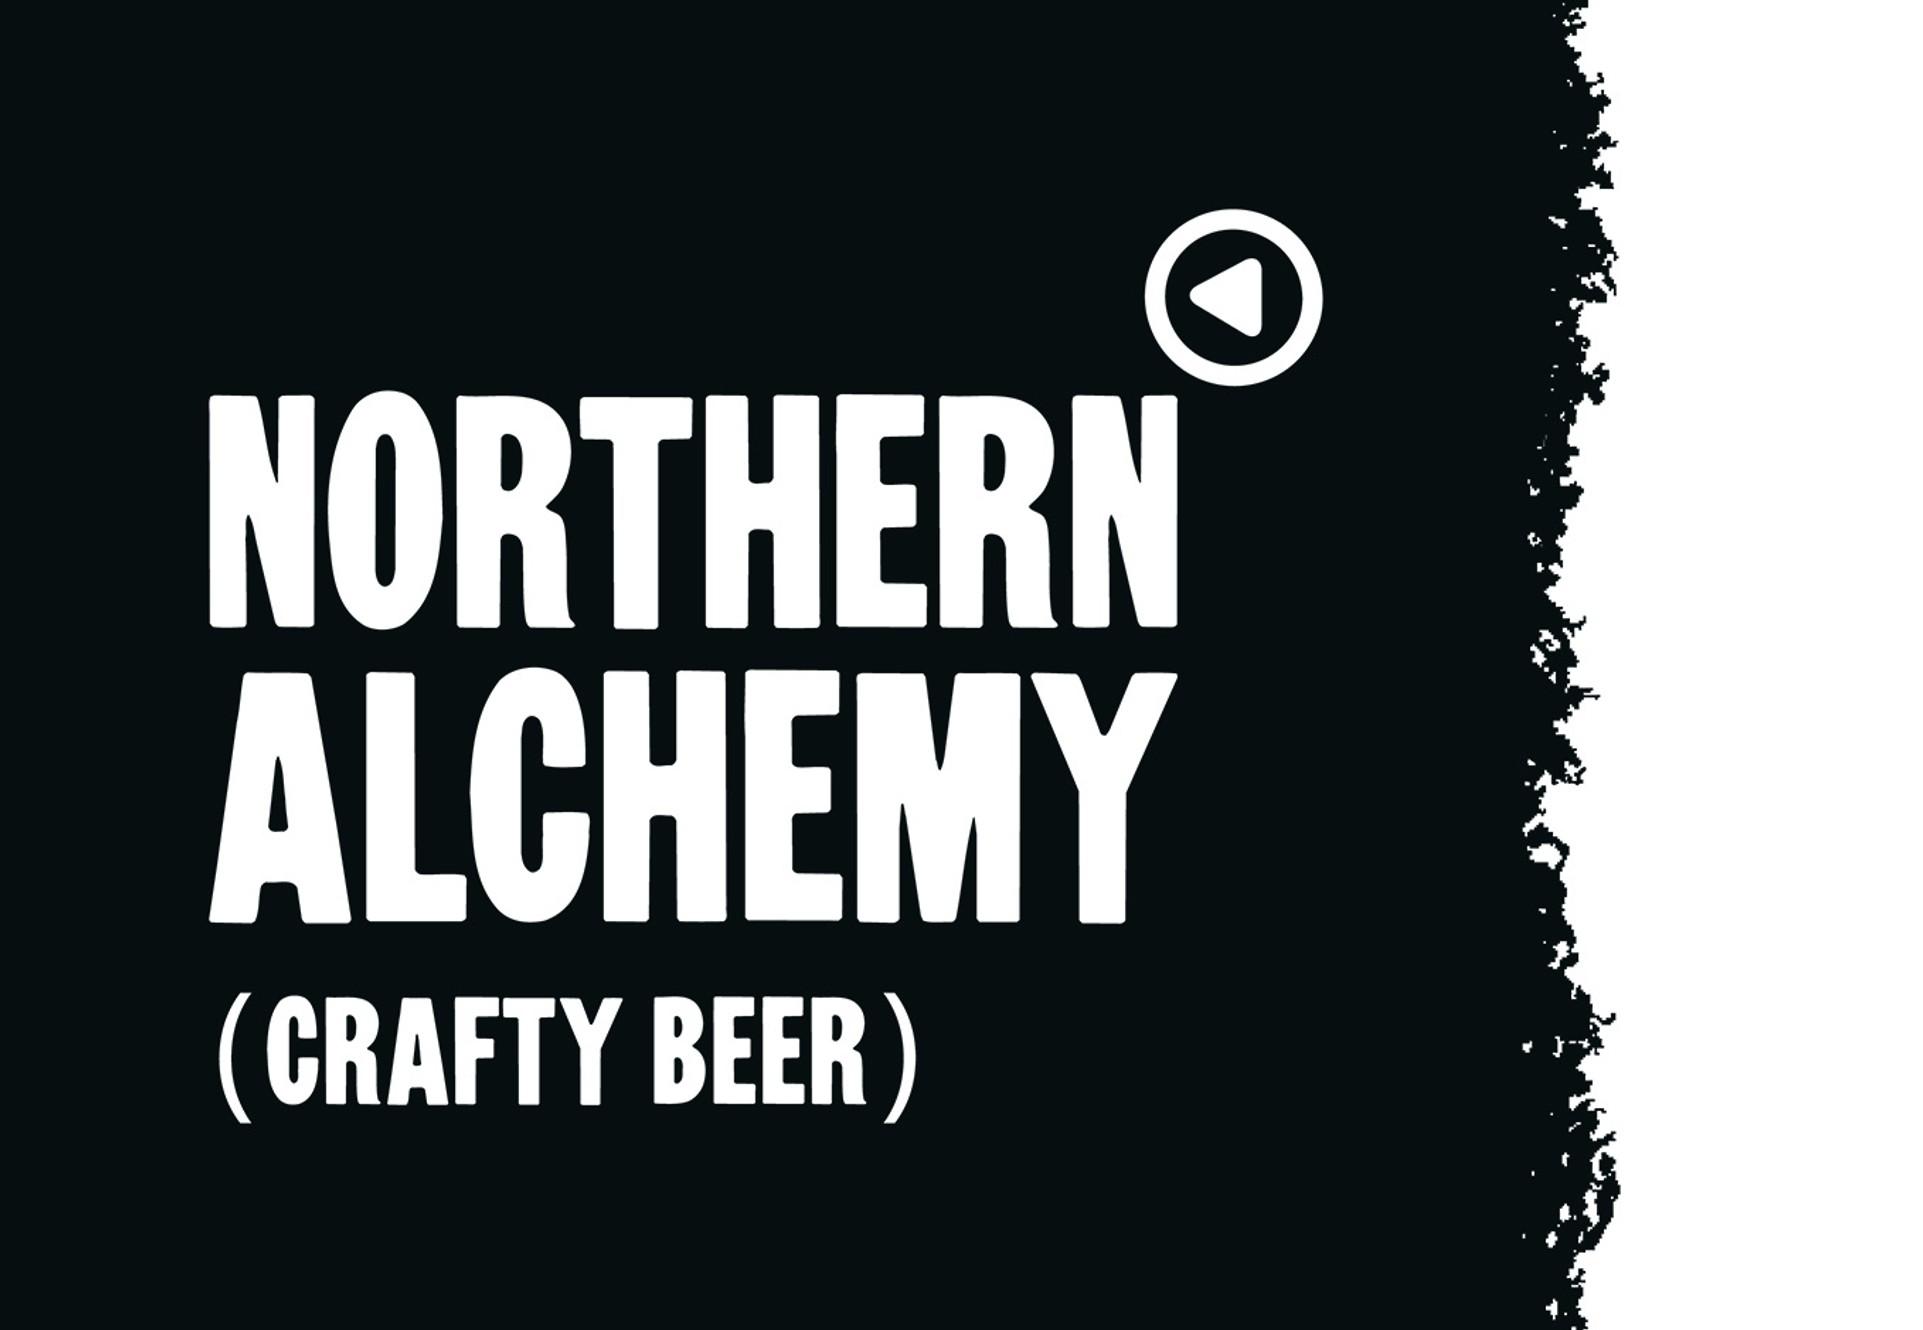 Microbrewery | Northern Alchemy